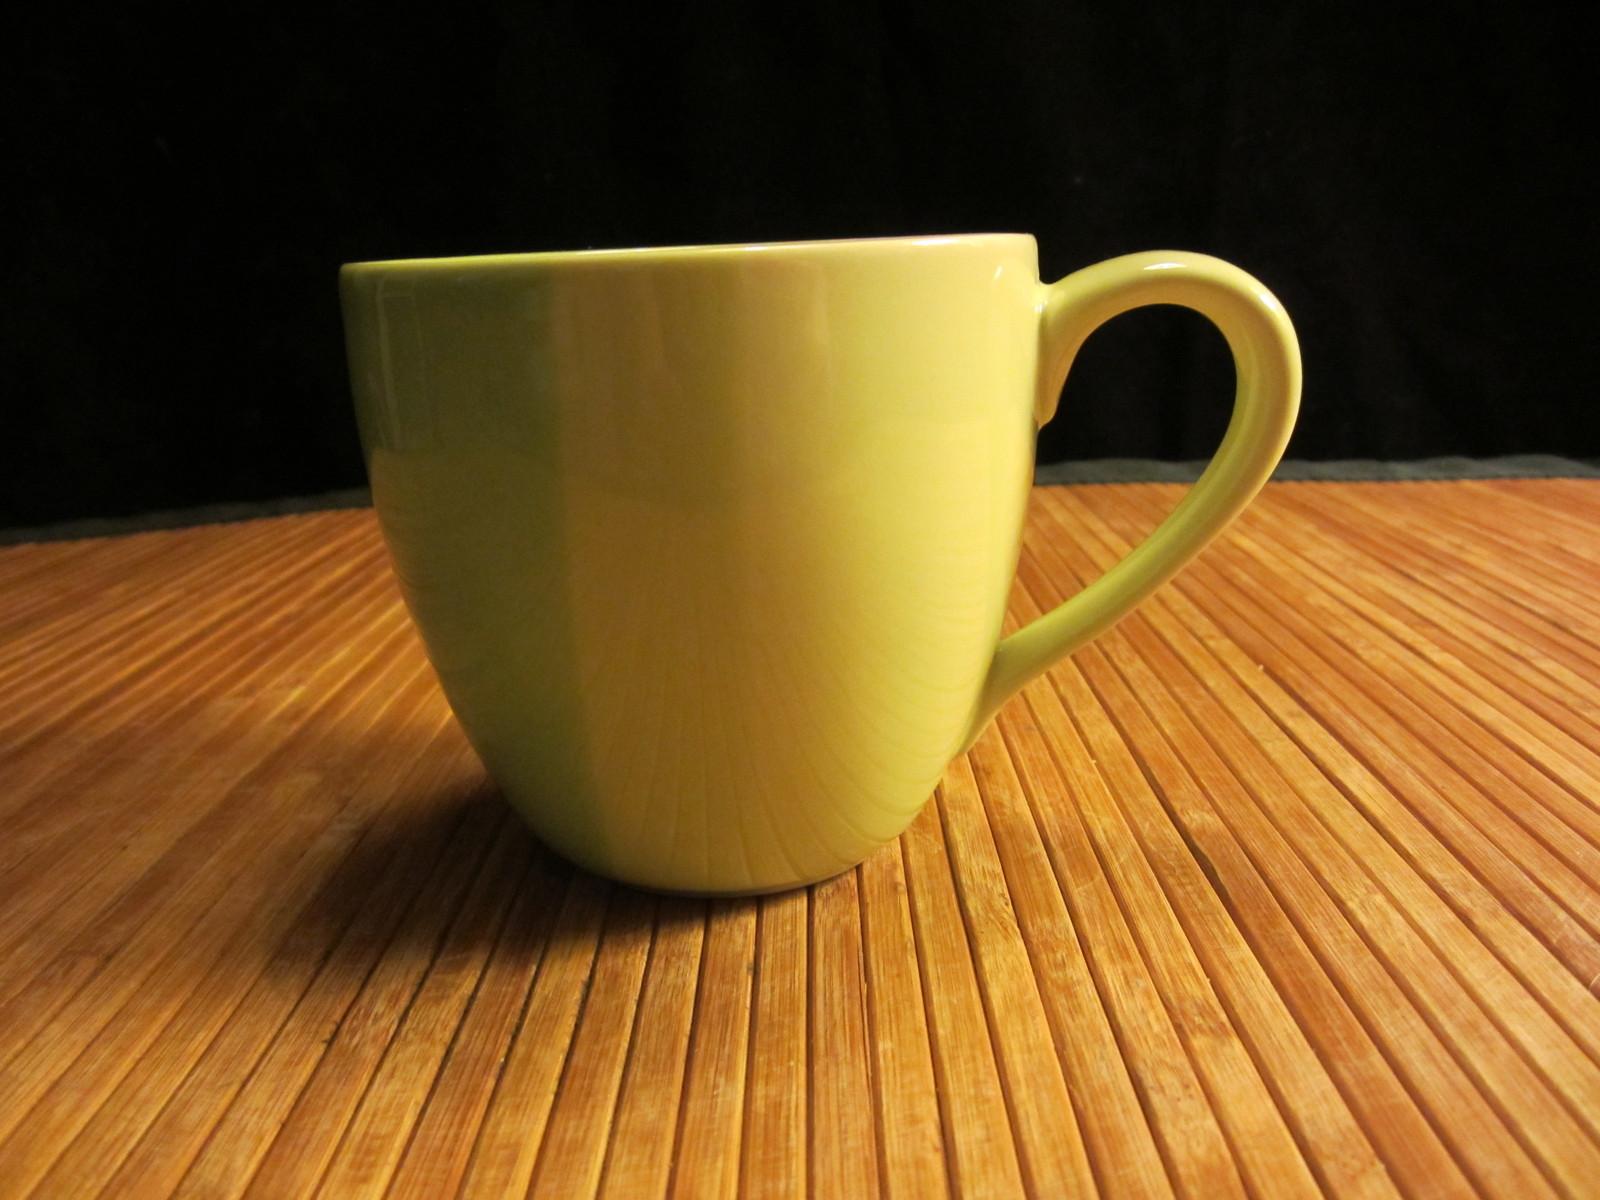 2005 Starbucks 3 Shades of Green Stripes Coffee Mug Tea Cup